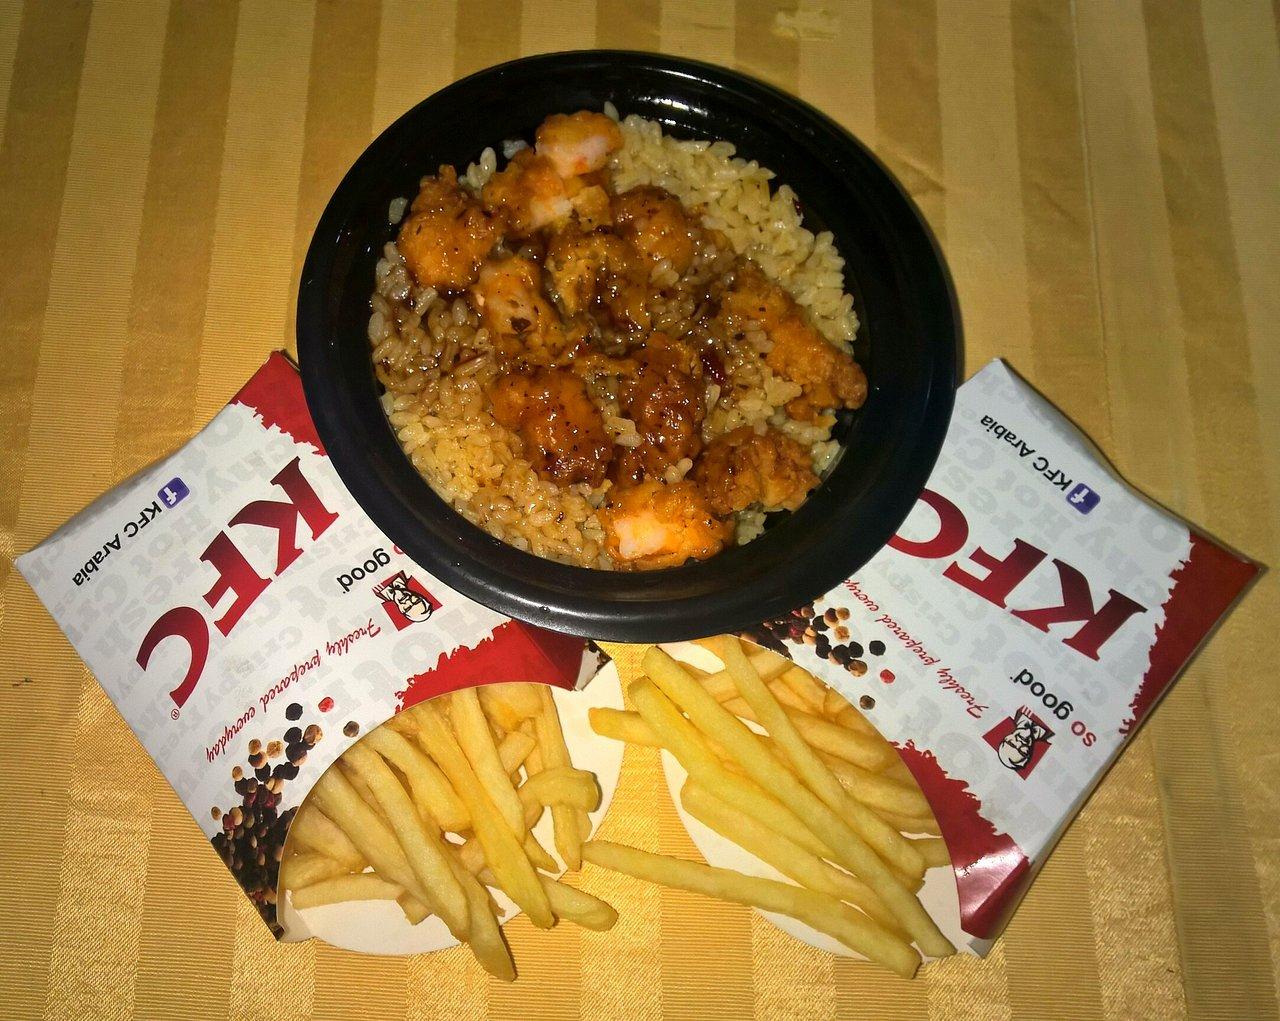 Kfc Shrimp Rizo Meal صورة كنتاكى مدينة العاشر من رمضان Tripadvisor